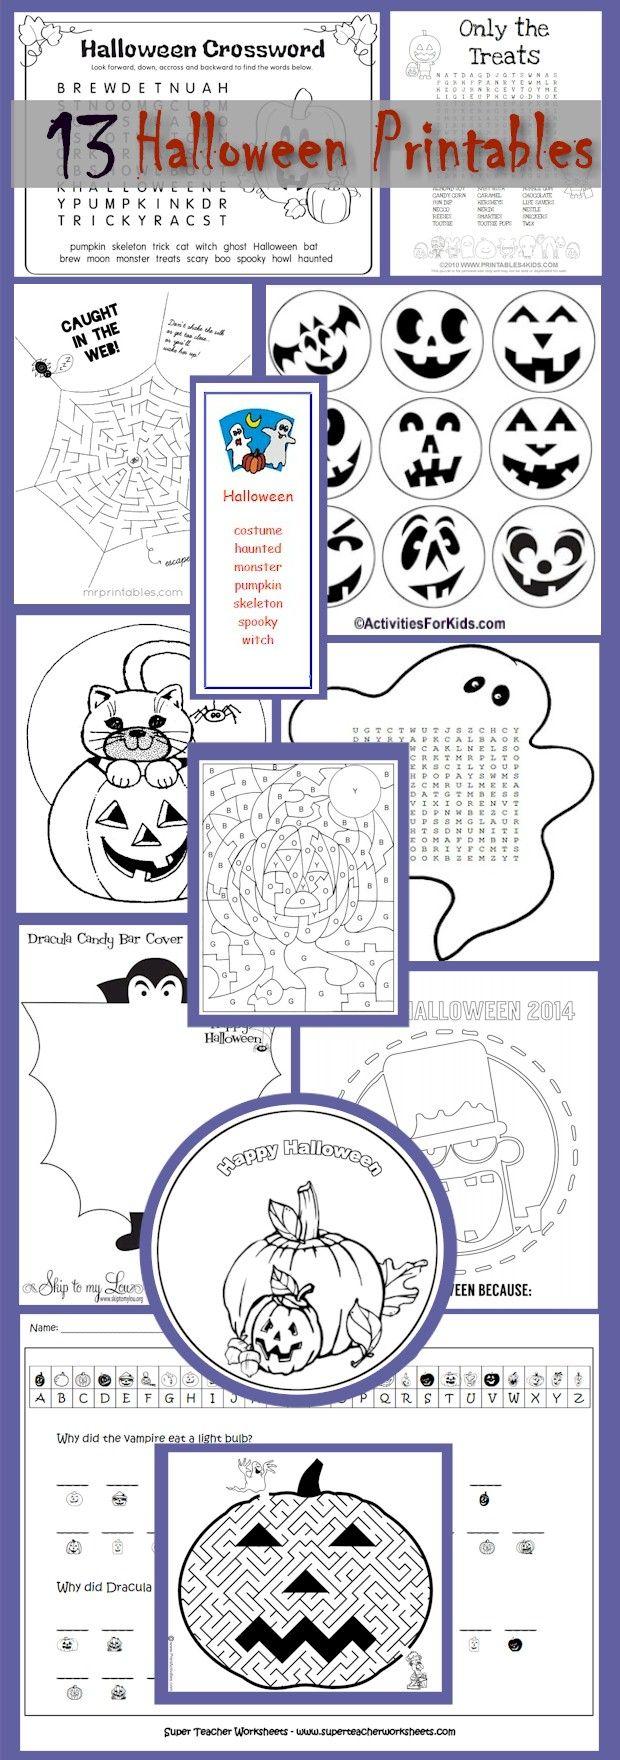 halloween printouts for kids classroom activities groups scouts 13 halloween printables for